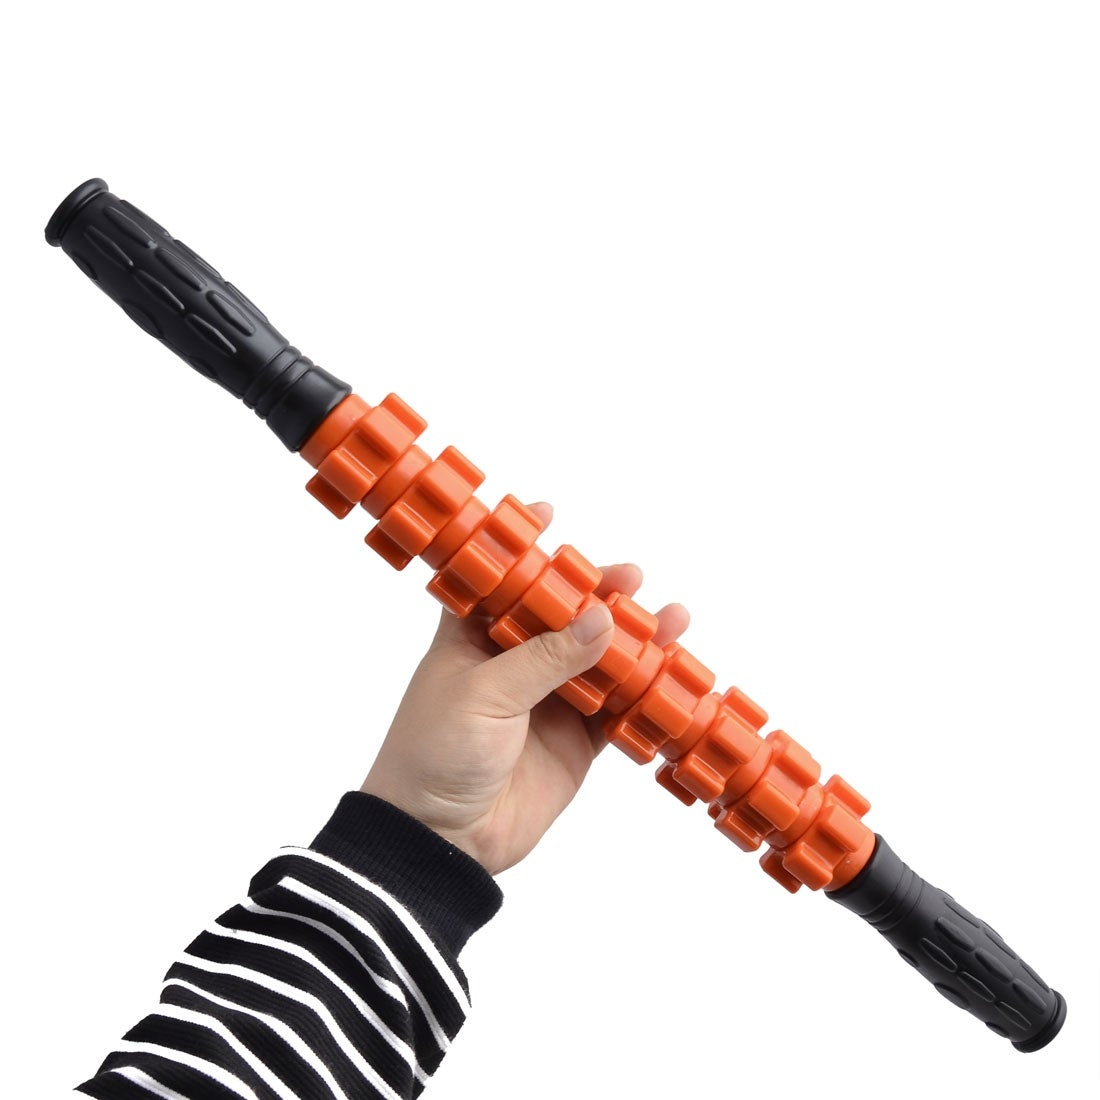 Plastic 9 Wheel Design Muscle Relaxing Roller Body Massage Stick Orange